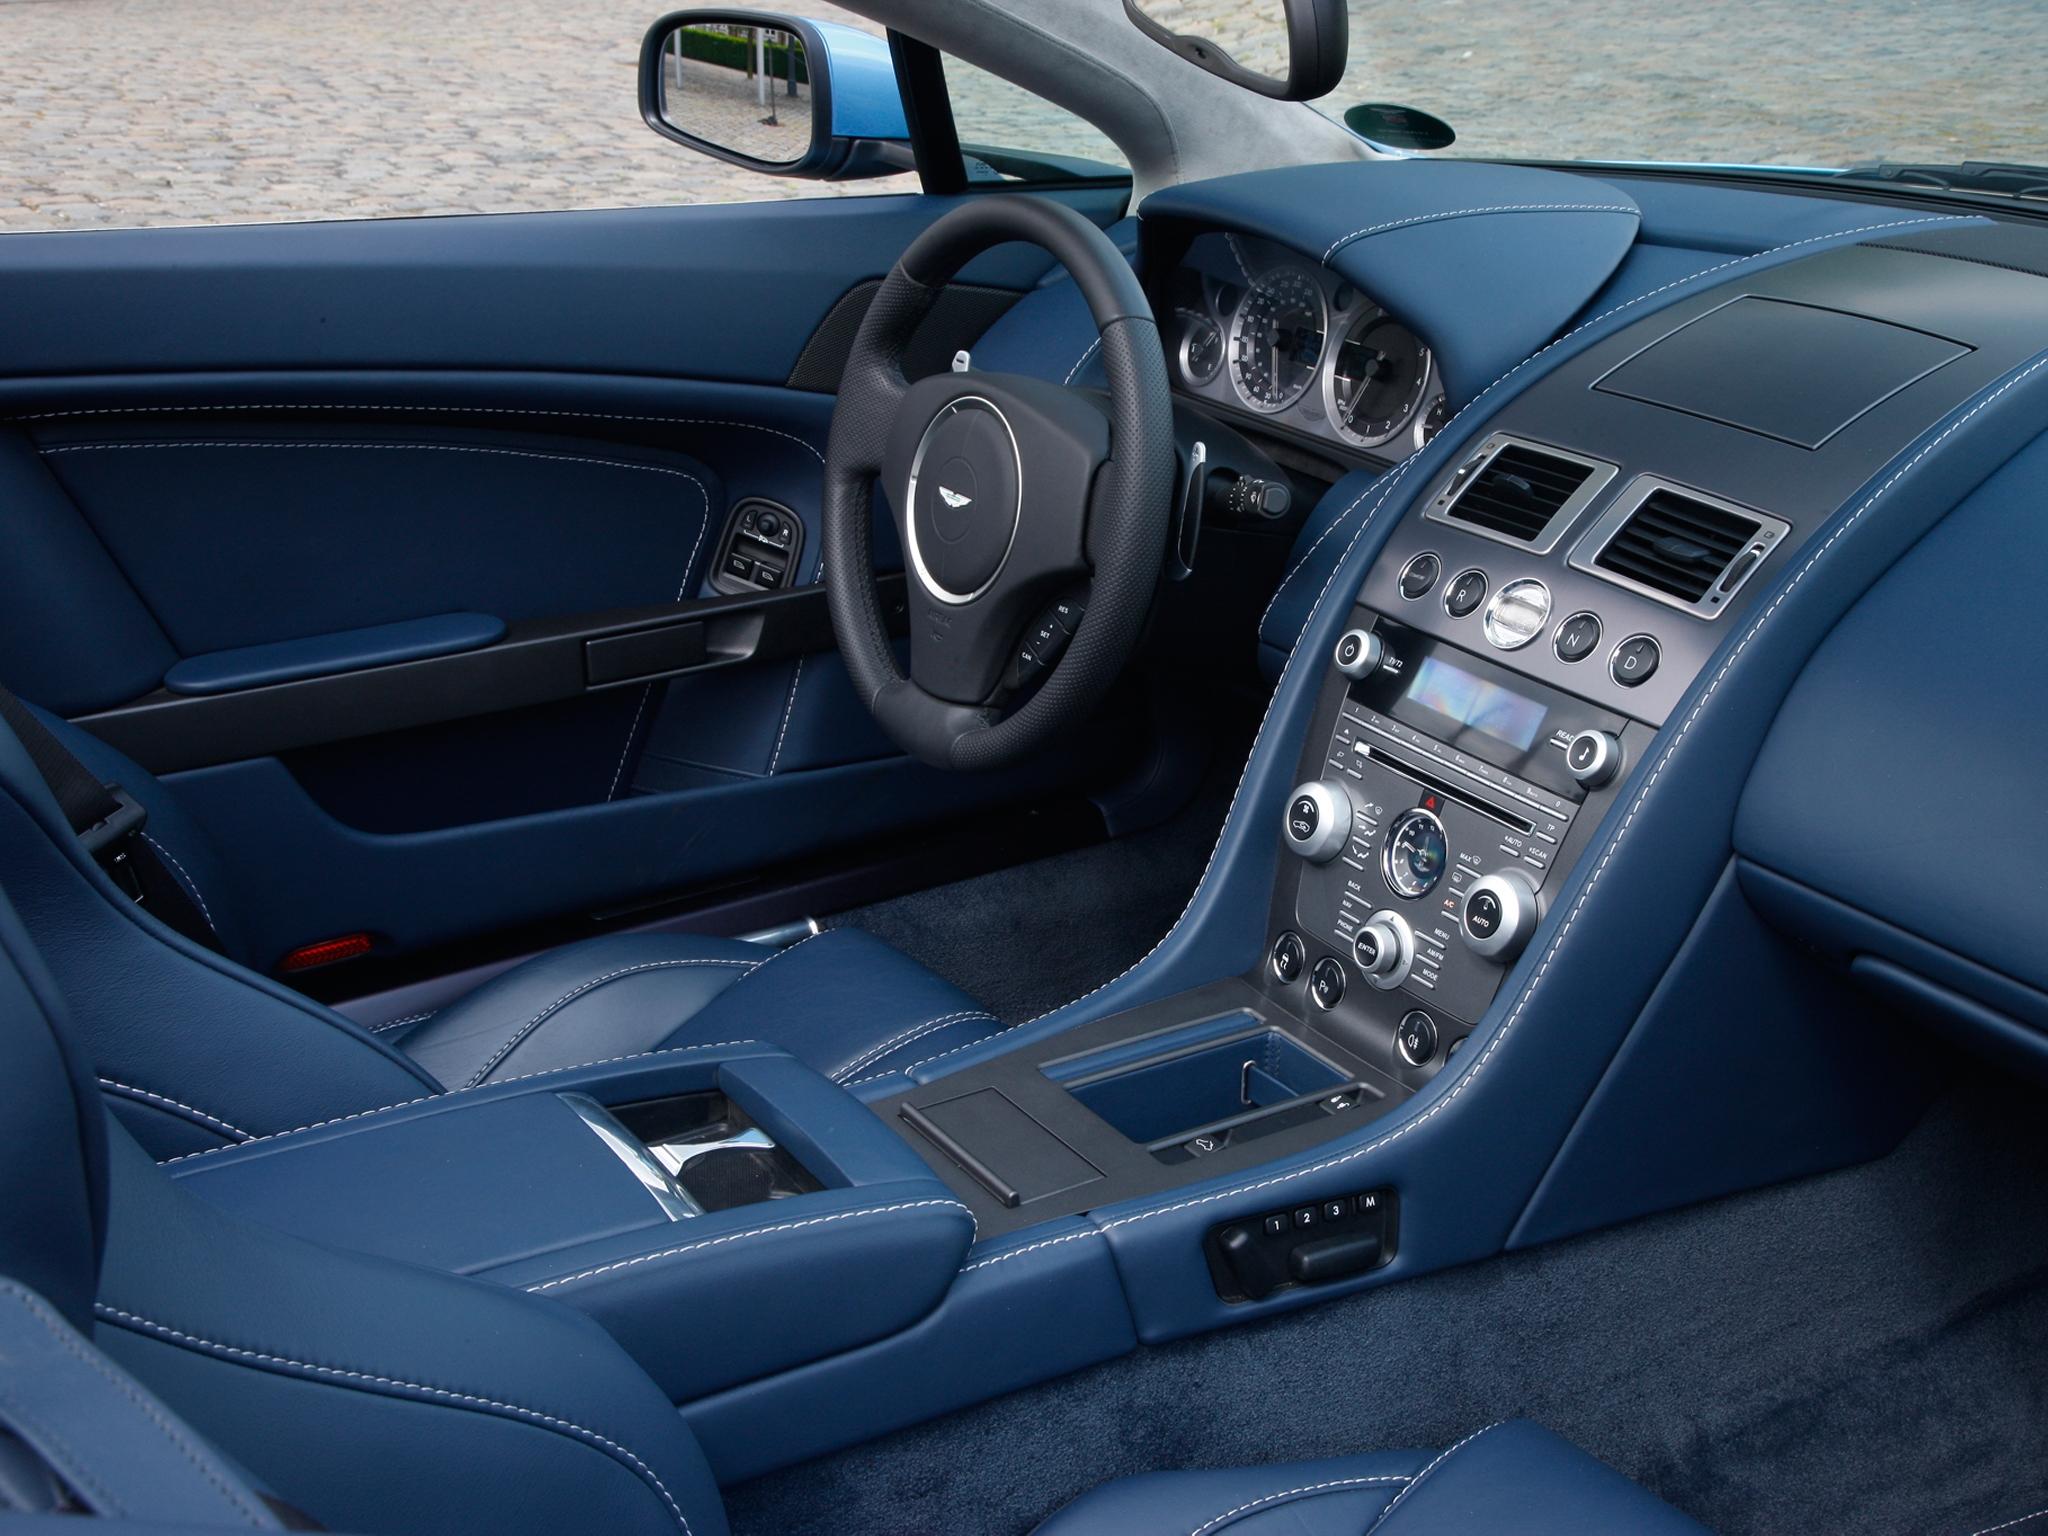 131864 скачать обои Астон Мартин (Aston Martin), Интерьер, Тачки (Cars), Синий, 2008, Руль, Салон, Спидометр, V8, Vantage - заставки и картинки бесплатно